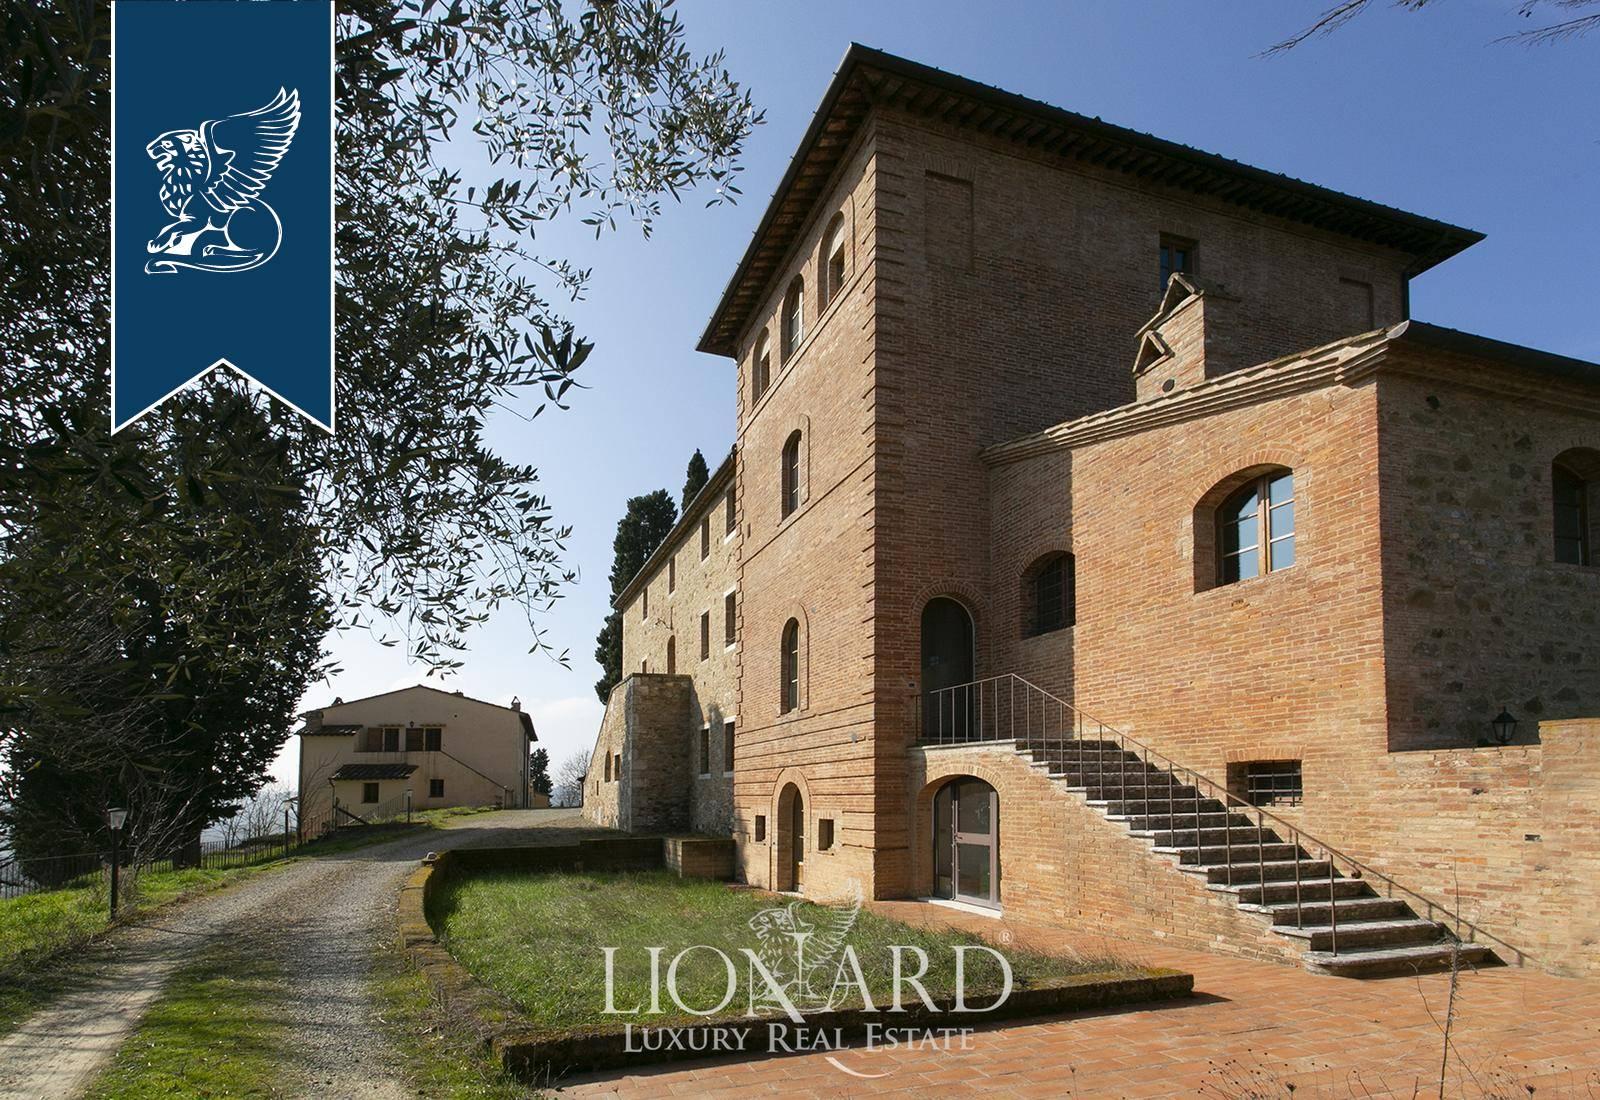 Agriturismo in Vendita a Castelnuovo Berardenga: 0 locali, 2500 mq - Foto 7